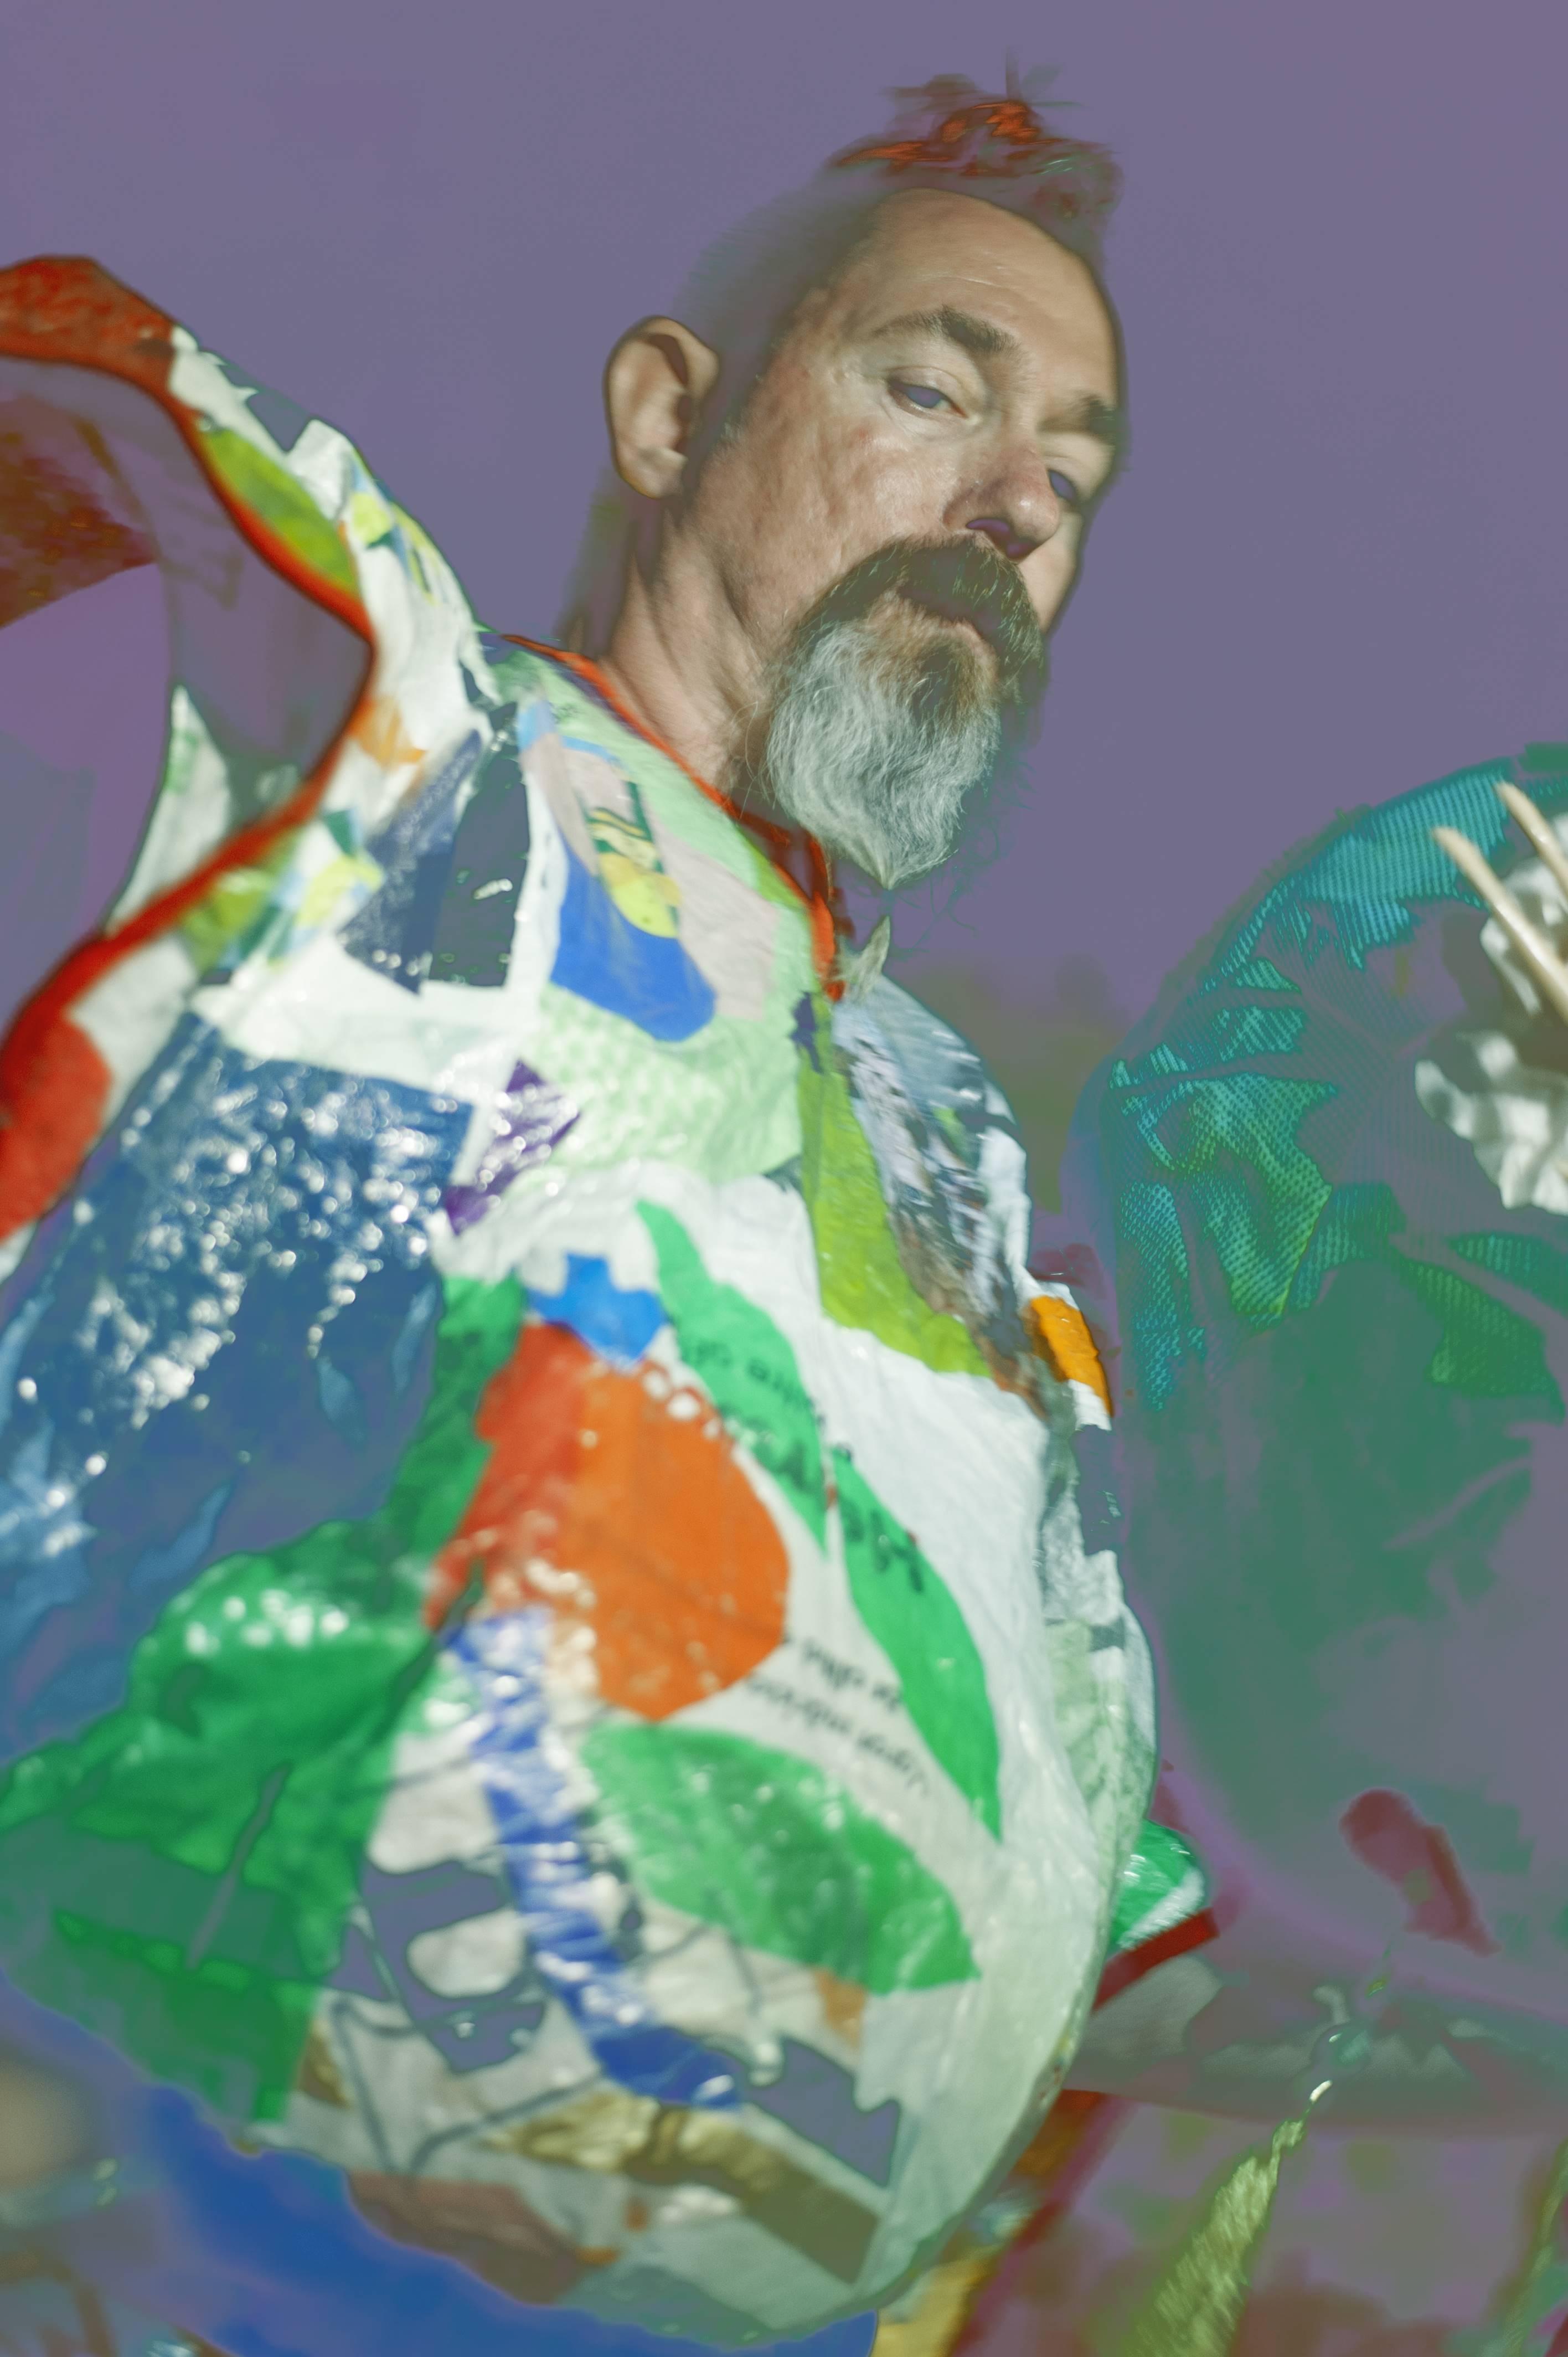 Model Patric Pålman